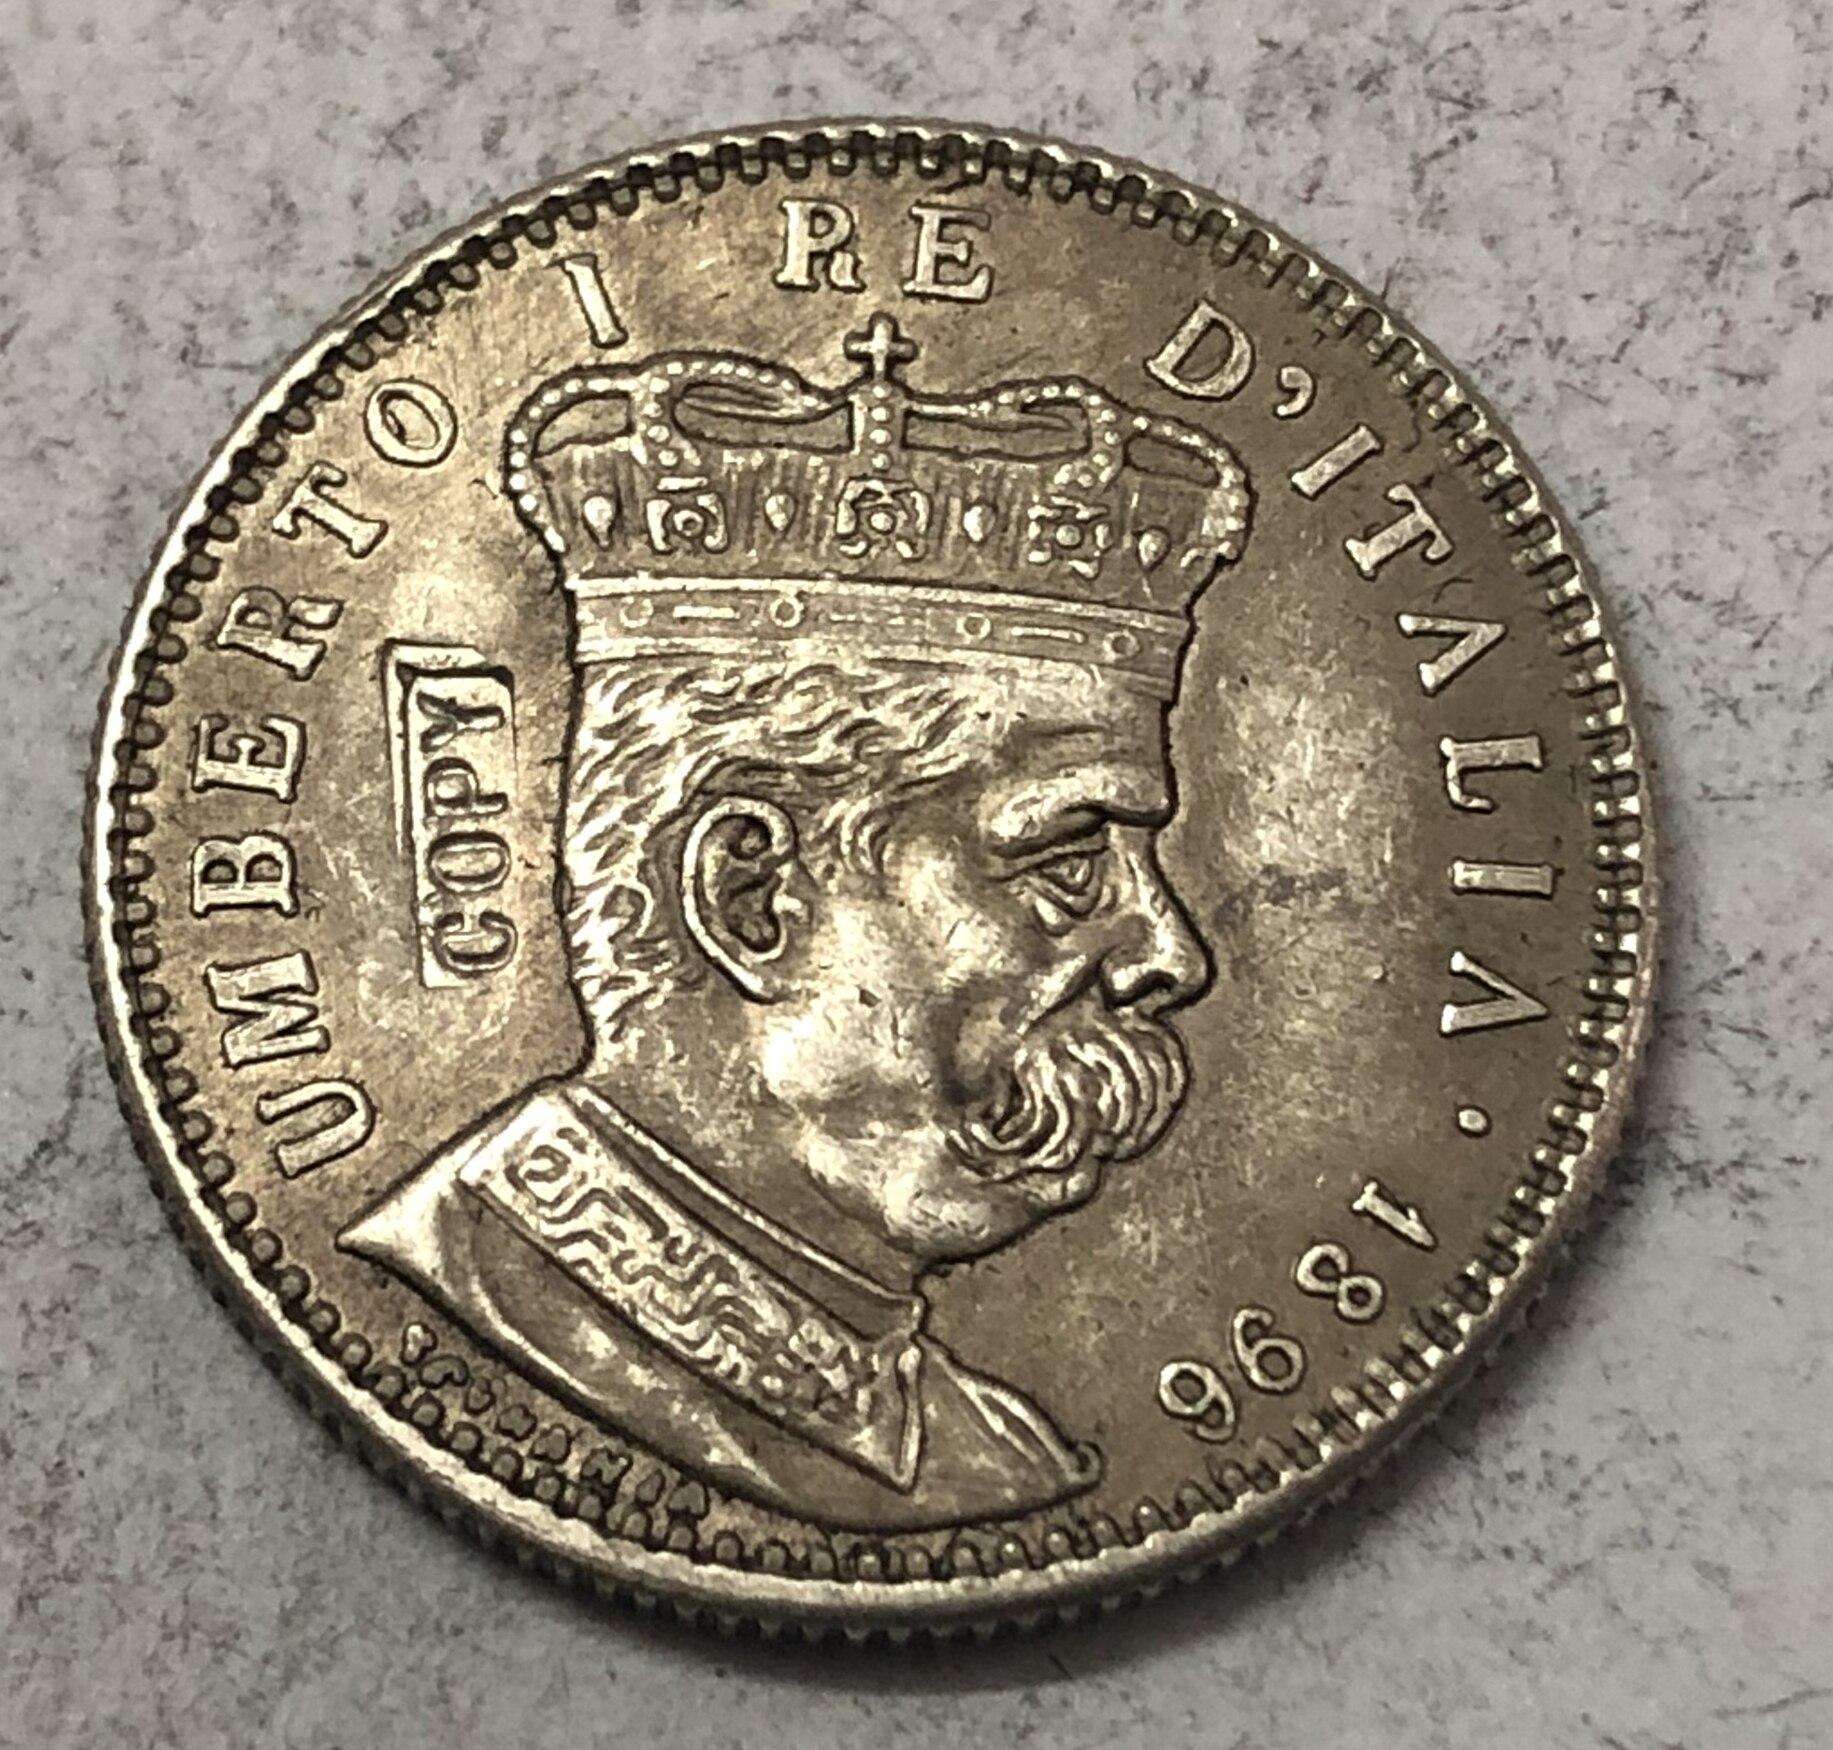 1896 Eritreia 1 Lira-Umberto I Cópia Moeda de Prata